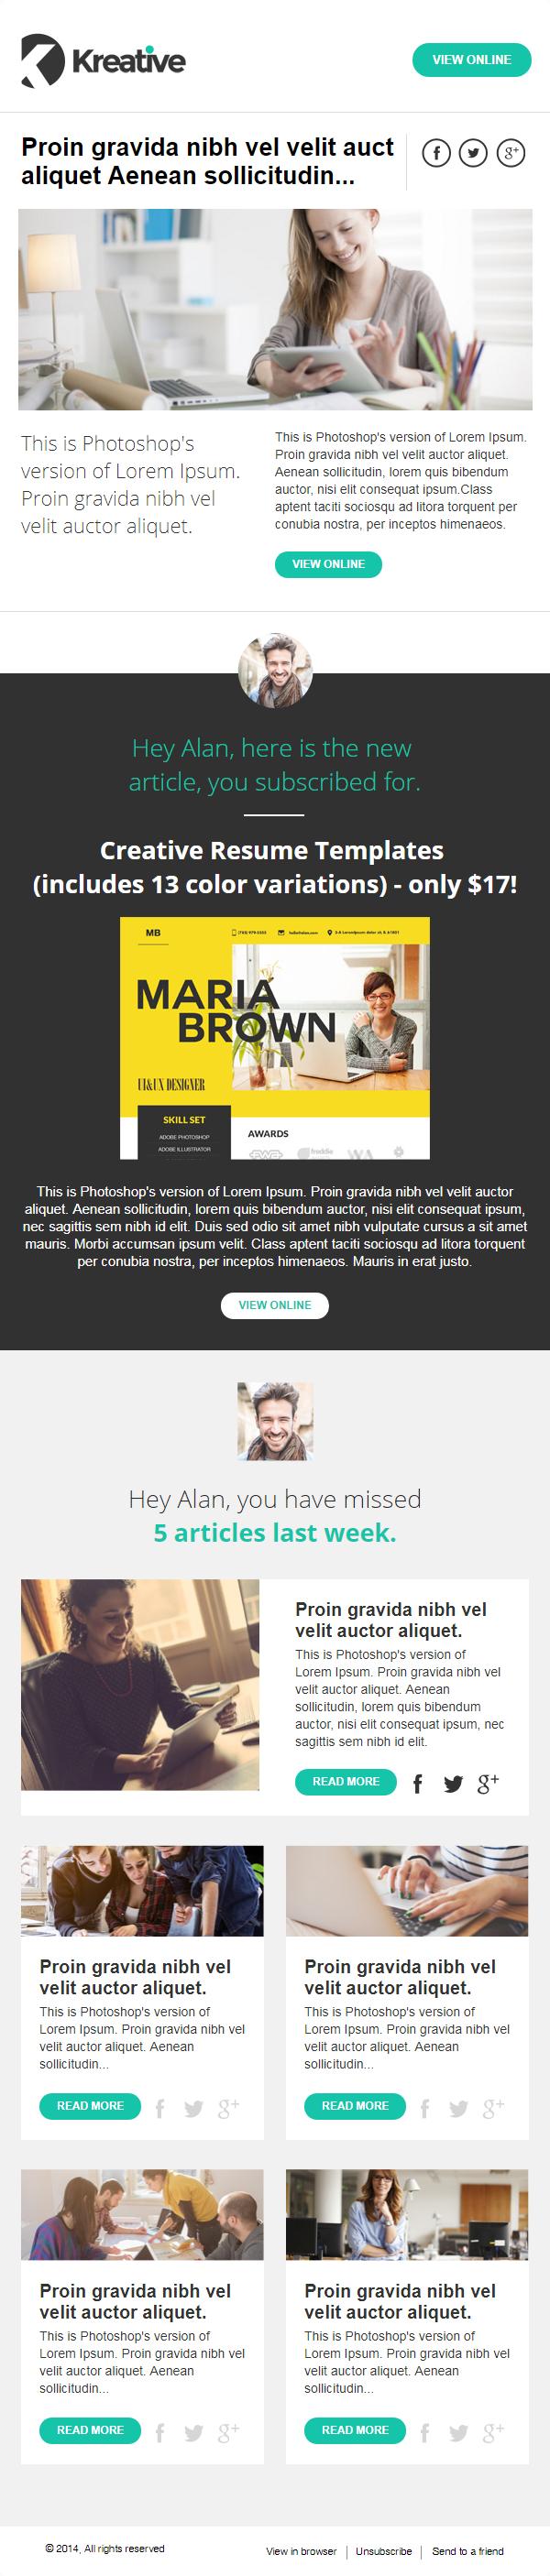 Kreative - Free Newsletter Template